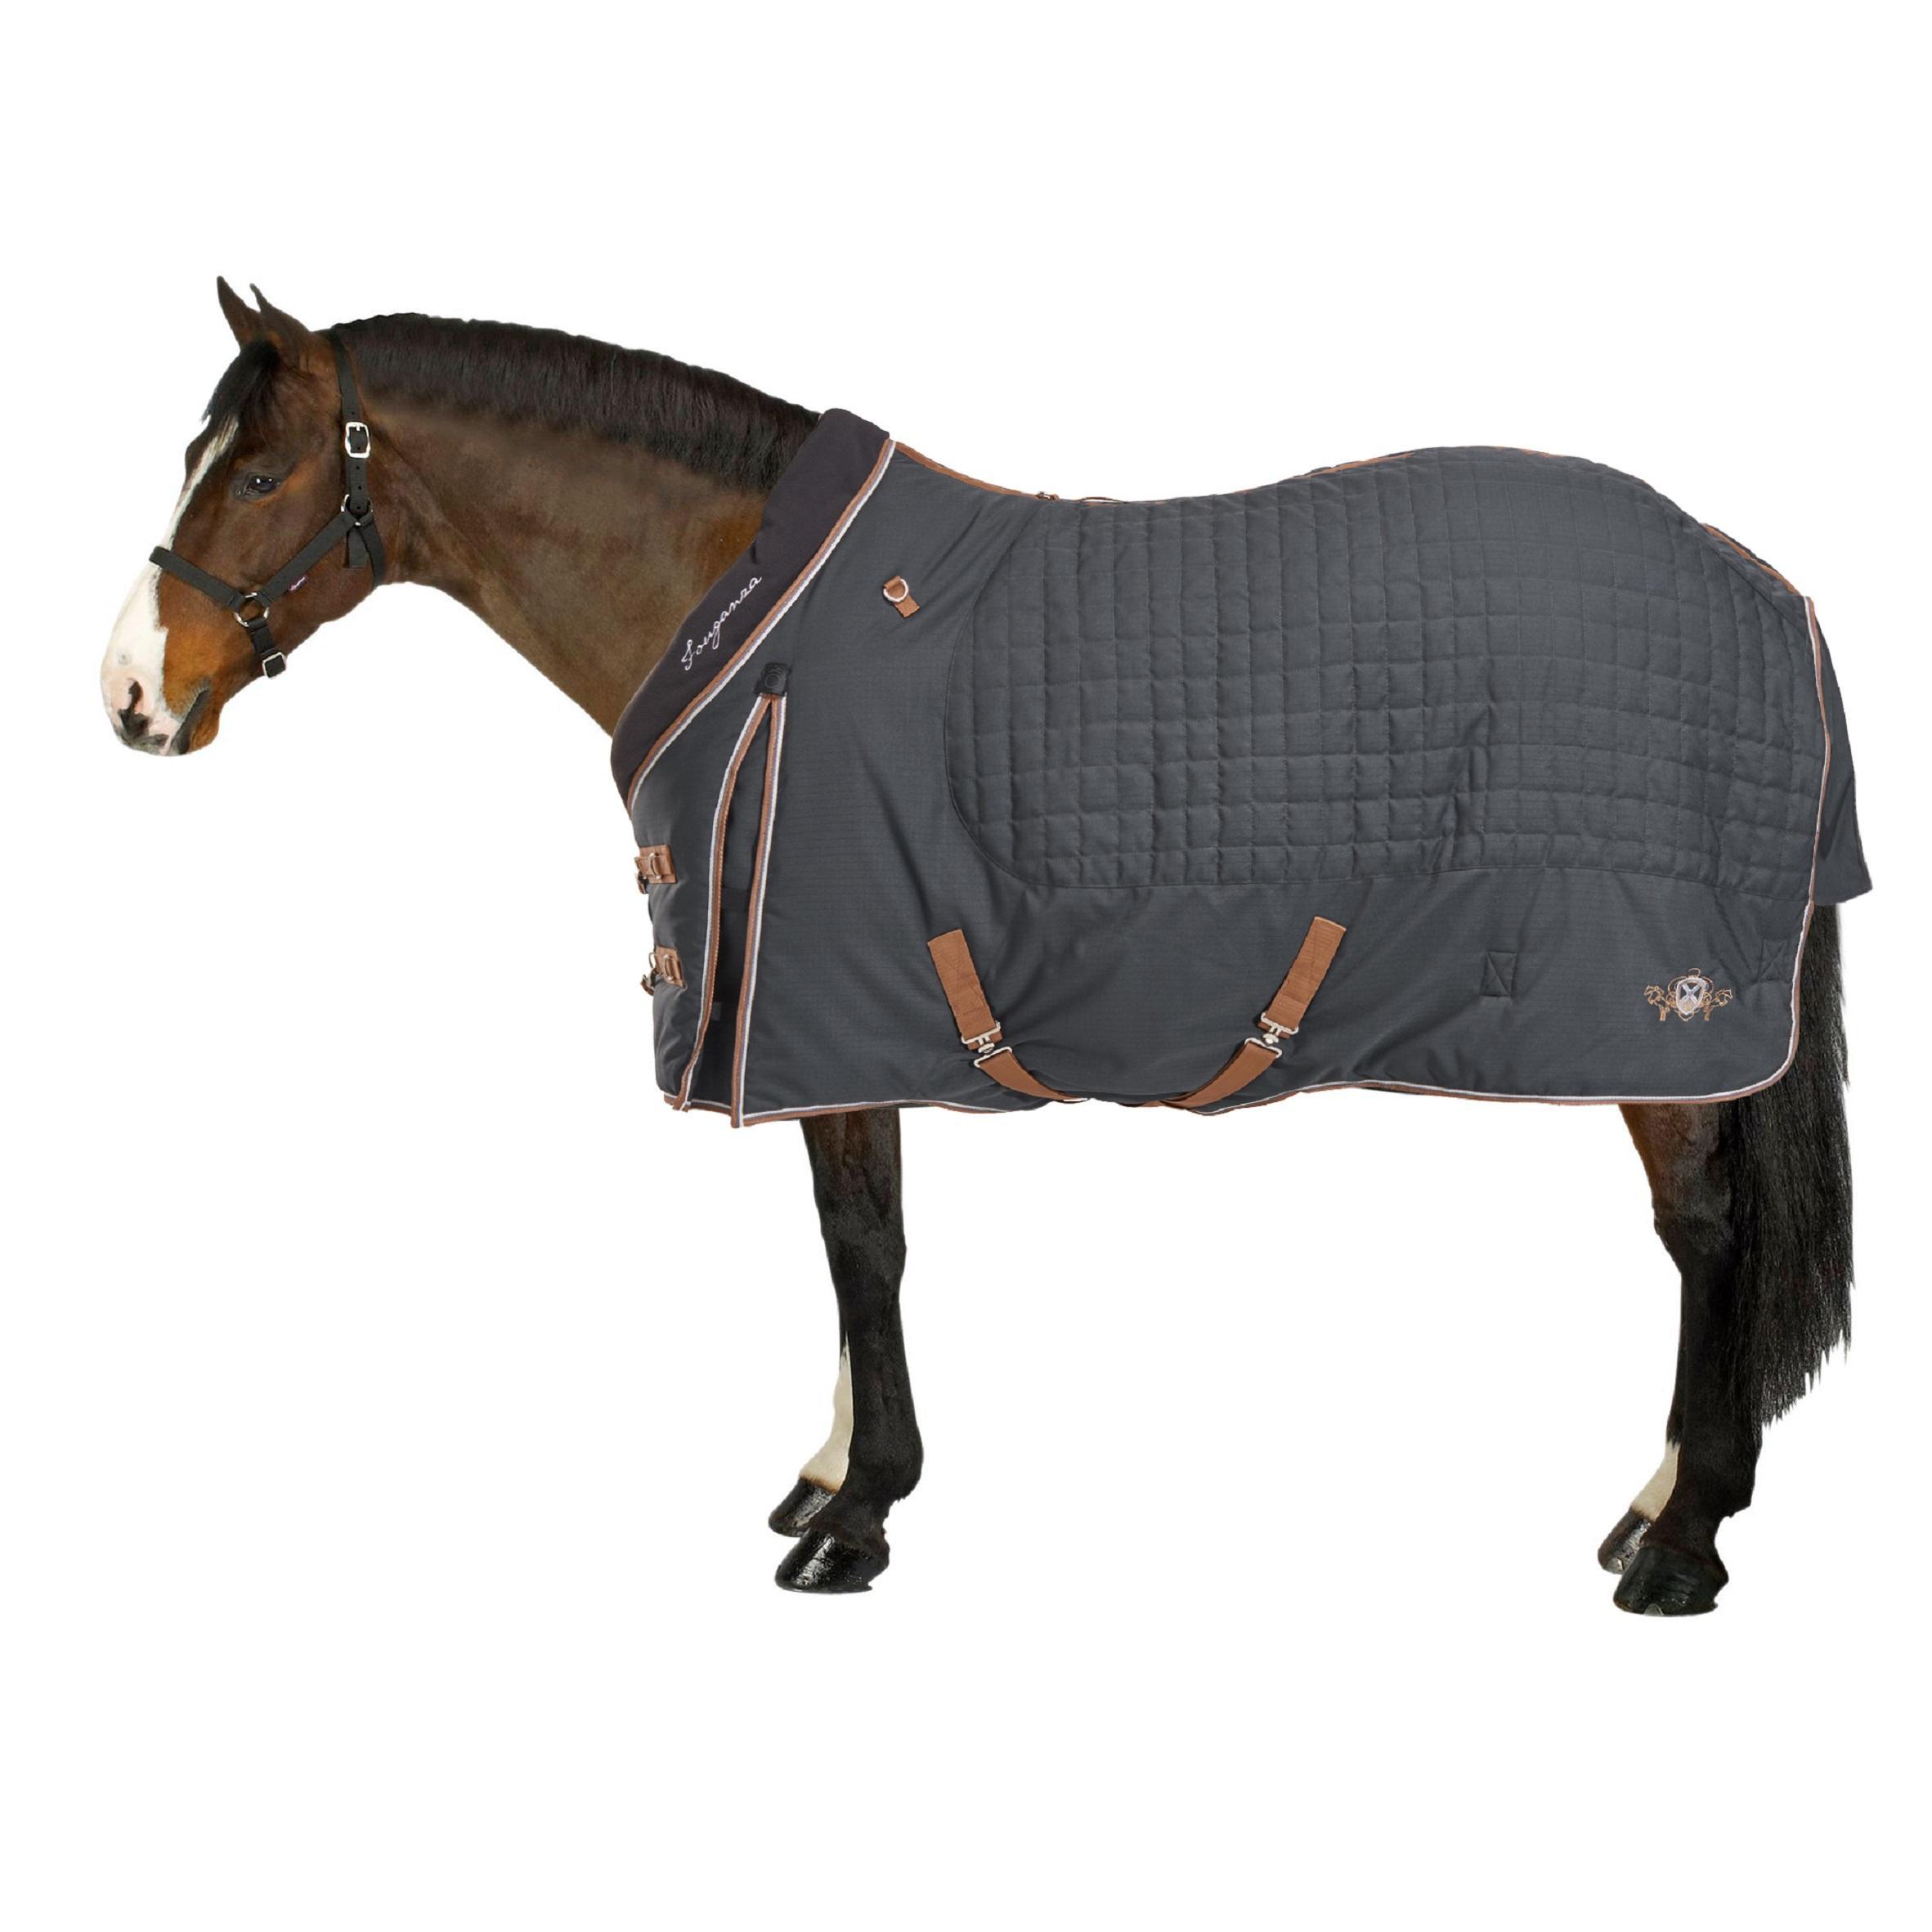 Fouganza Staldeken Stable 400gr ruitersport - pony en paard